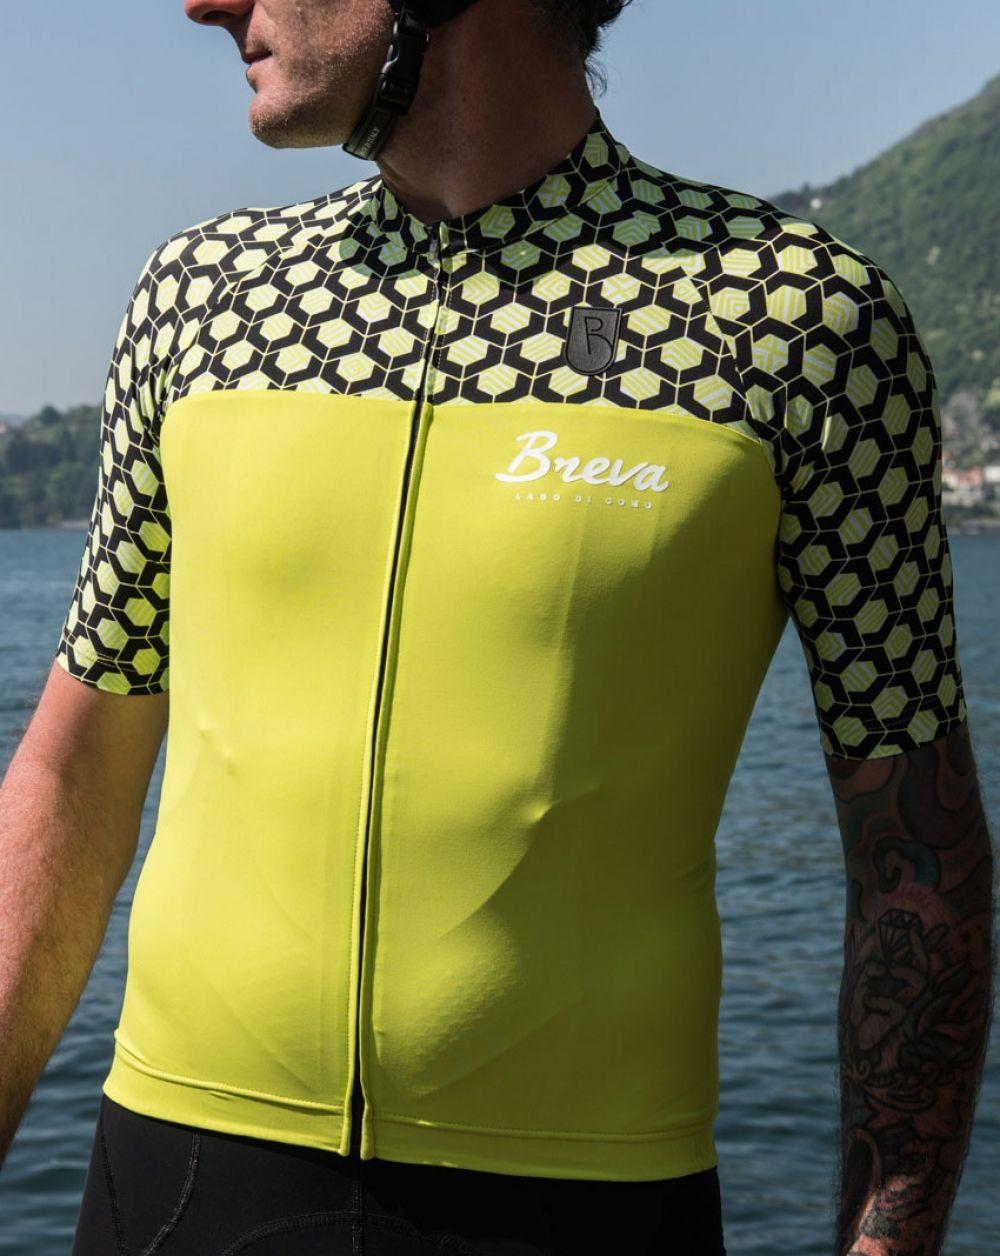 Jersey Race2 Man Breva Cycling Cycling Jersey Design Biking Outfit Jersey Design